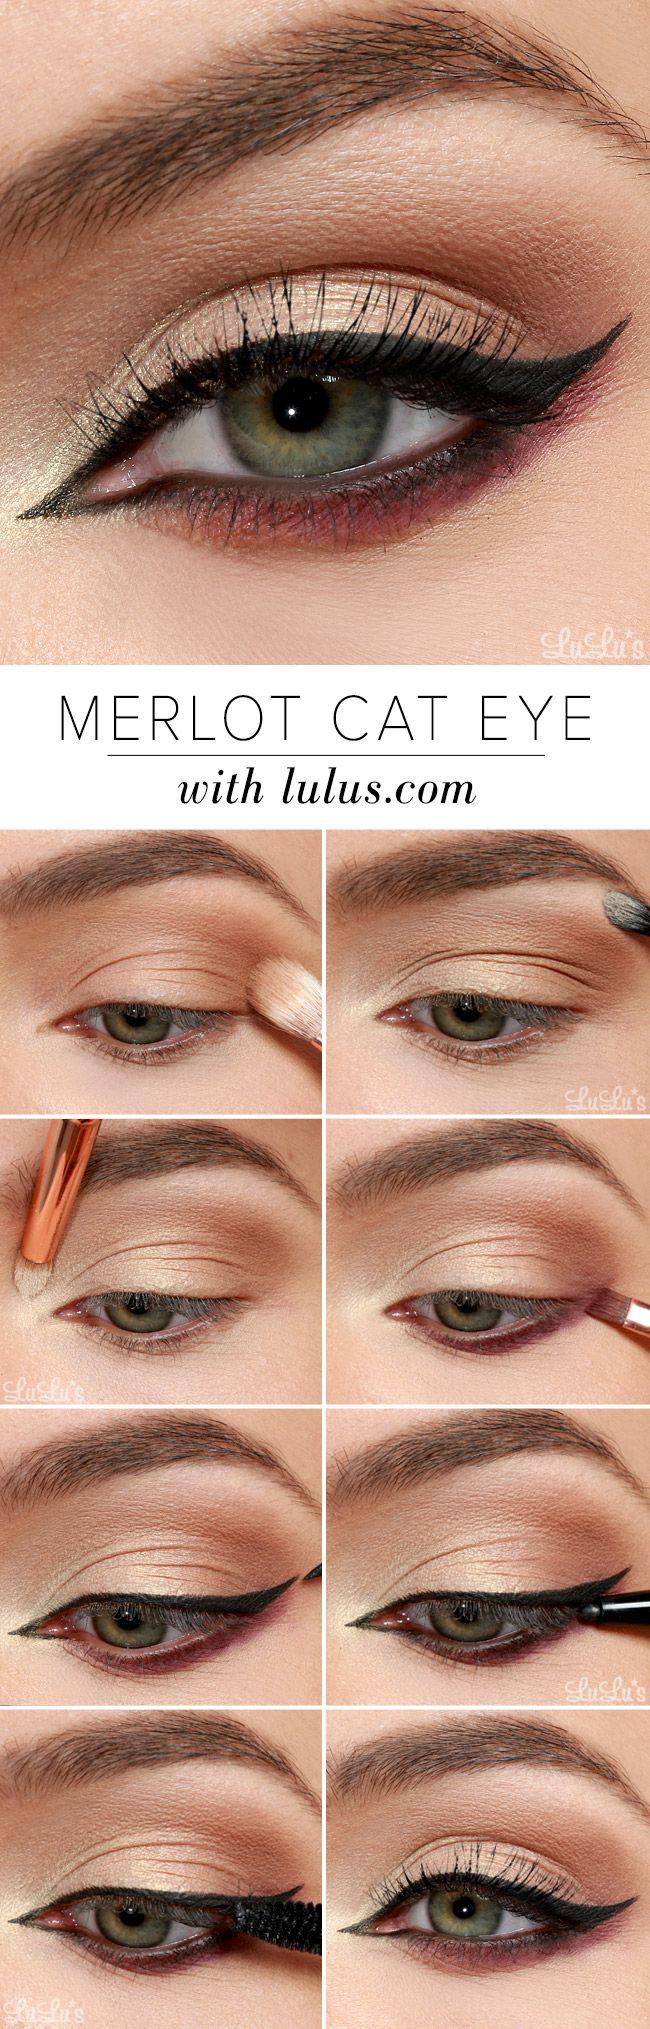 lulus how-to: merlot cat eye makeup tutorial | cat eye makeup